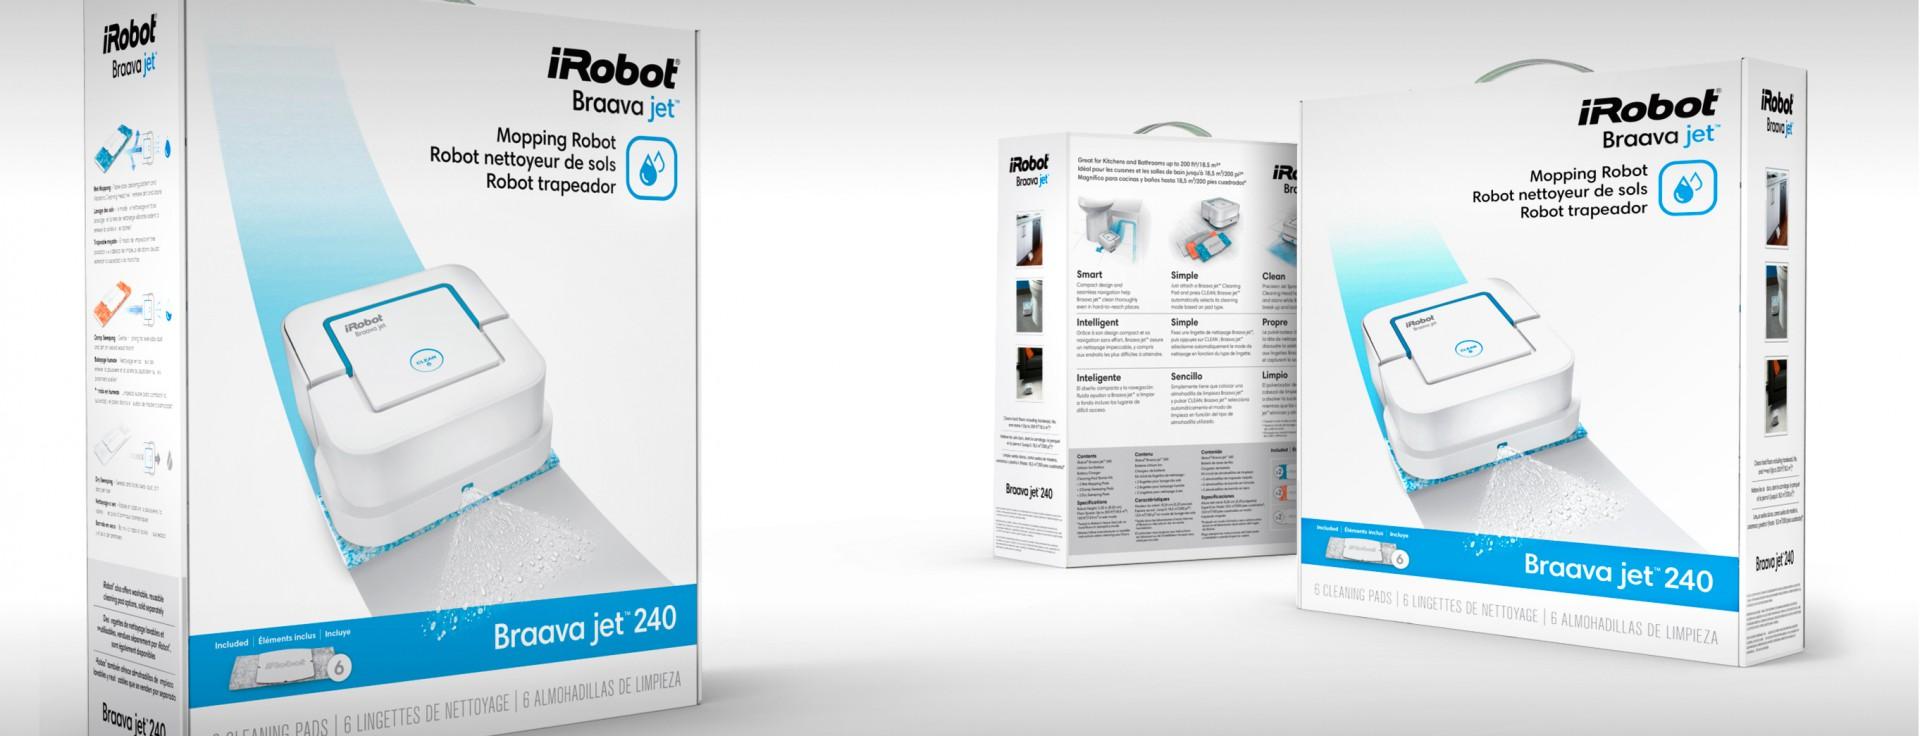 Scrolling2_Irobot